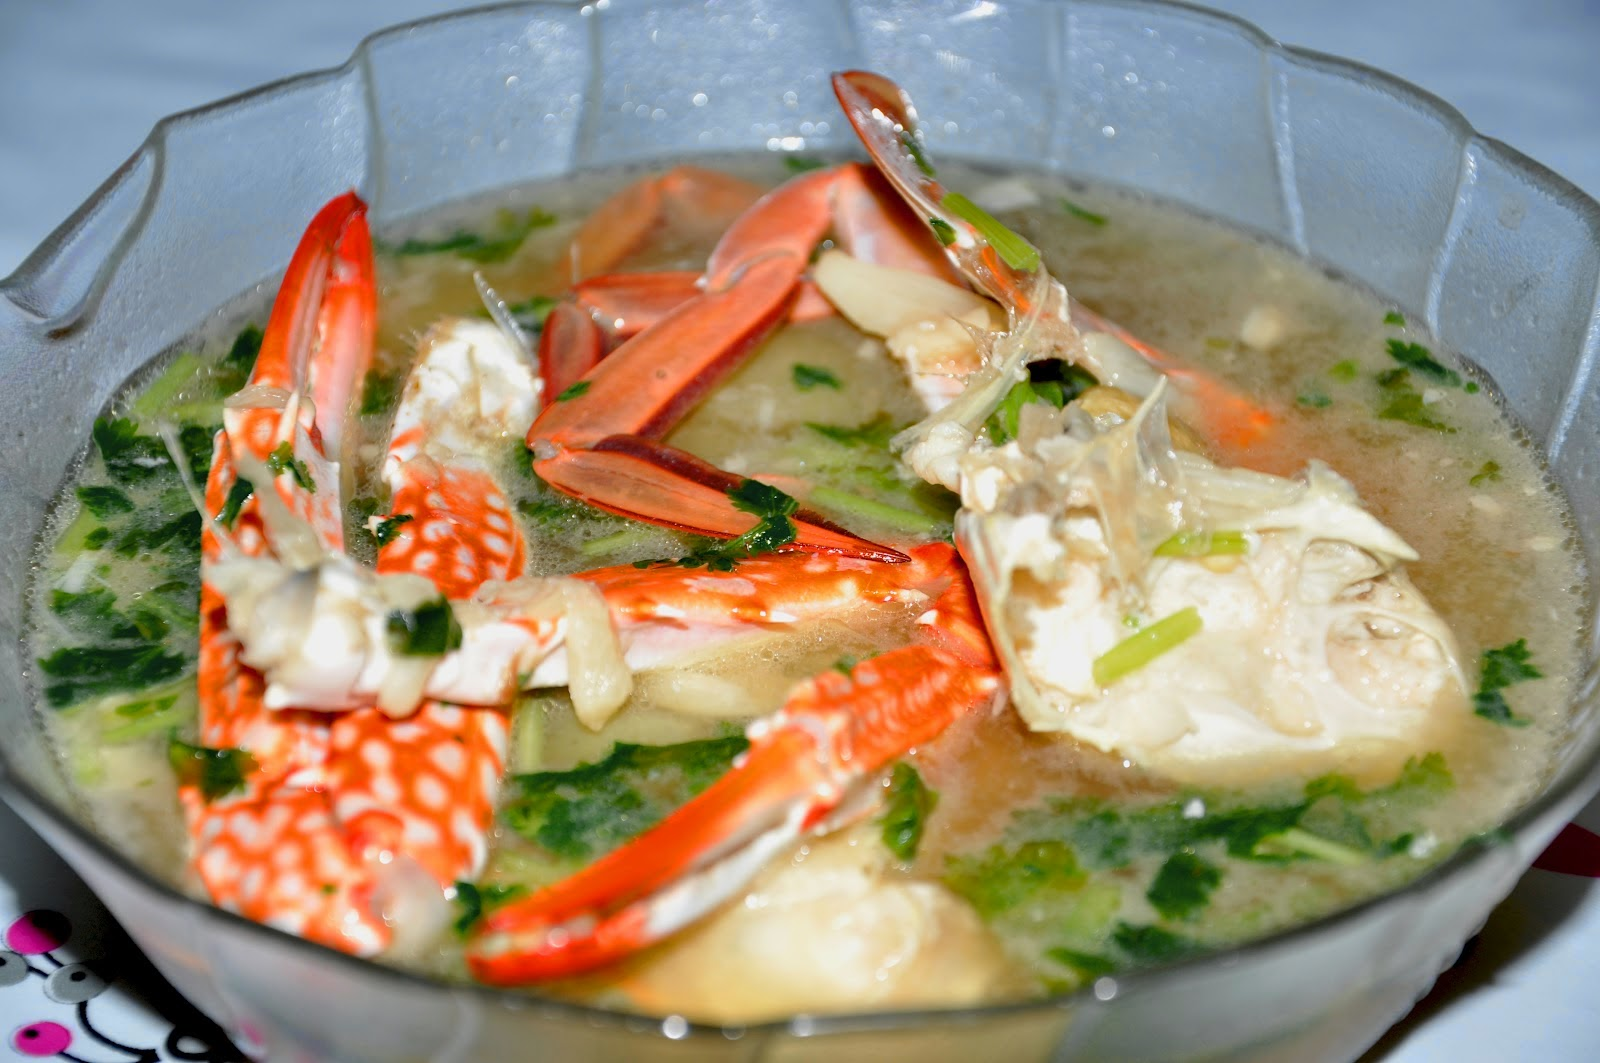 http://amaqlavitashop.blogspot.com/sup-ketam-sembuh-denggi